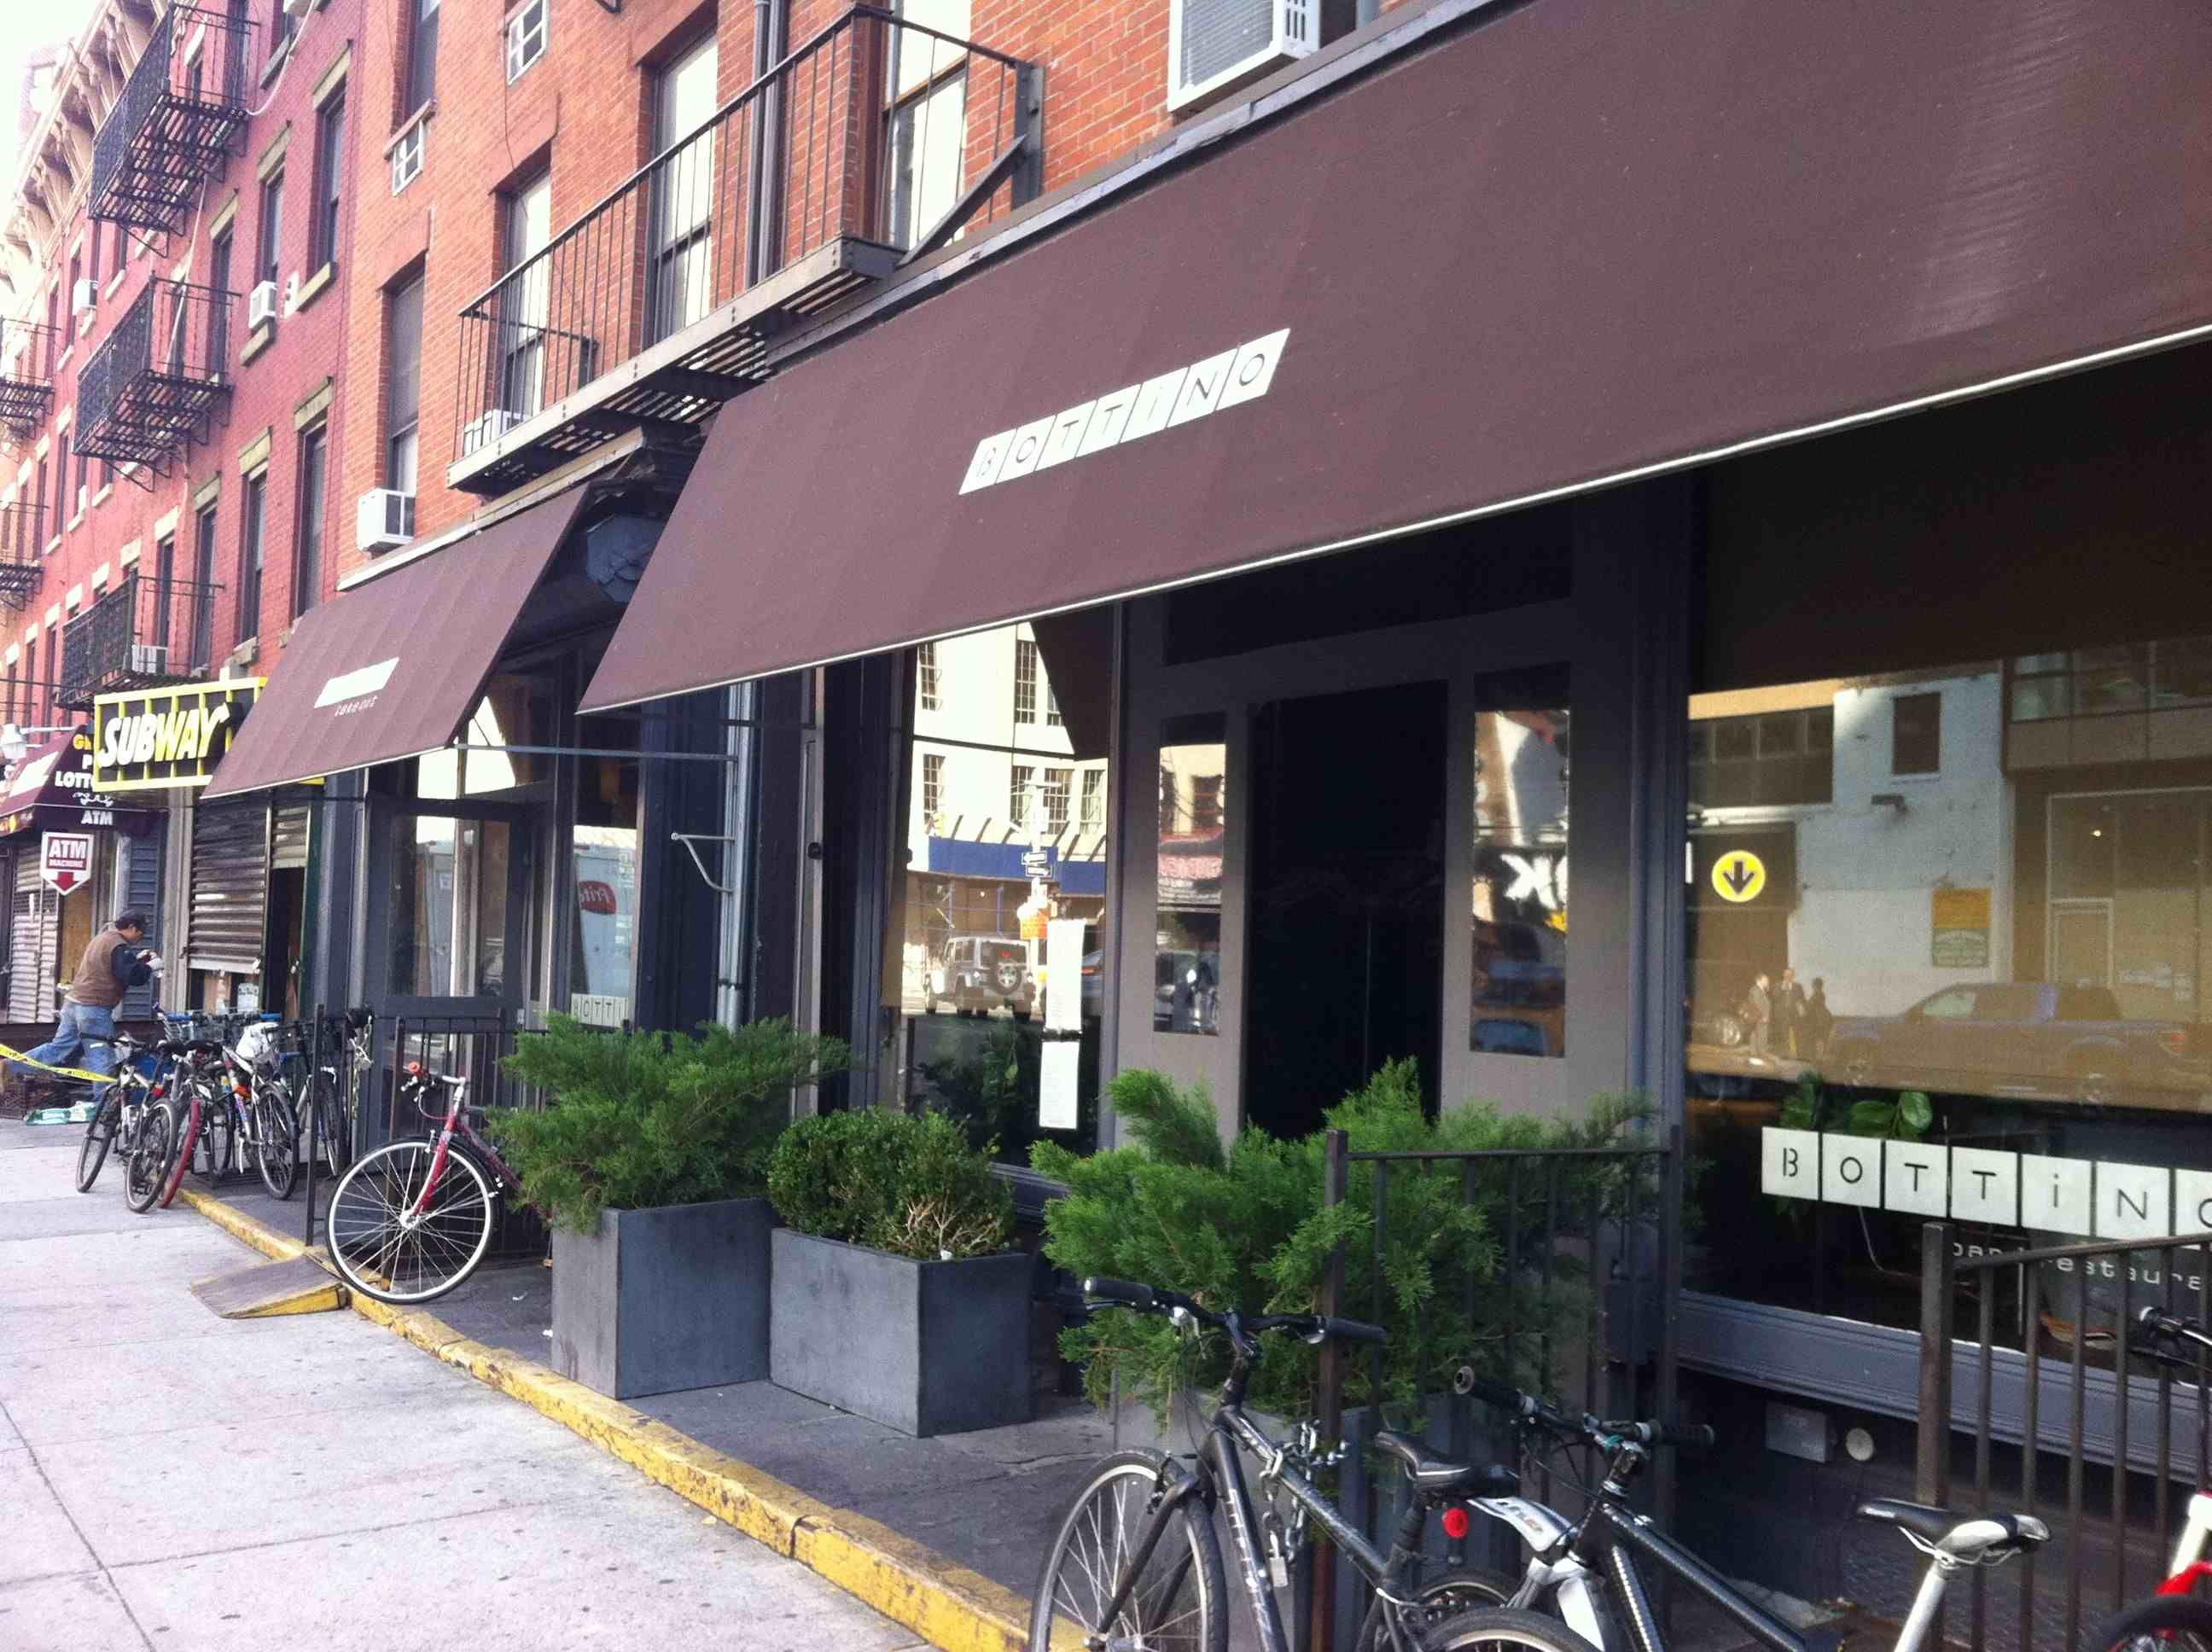 Bottino NYC 246 tenth avenue, Chelsea Great modern Italian ...